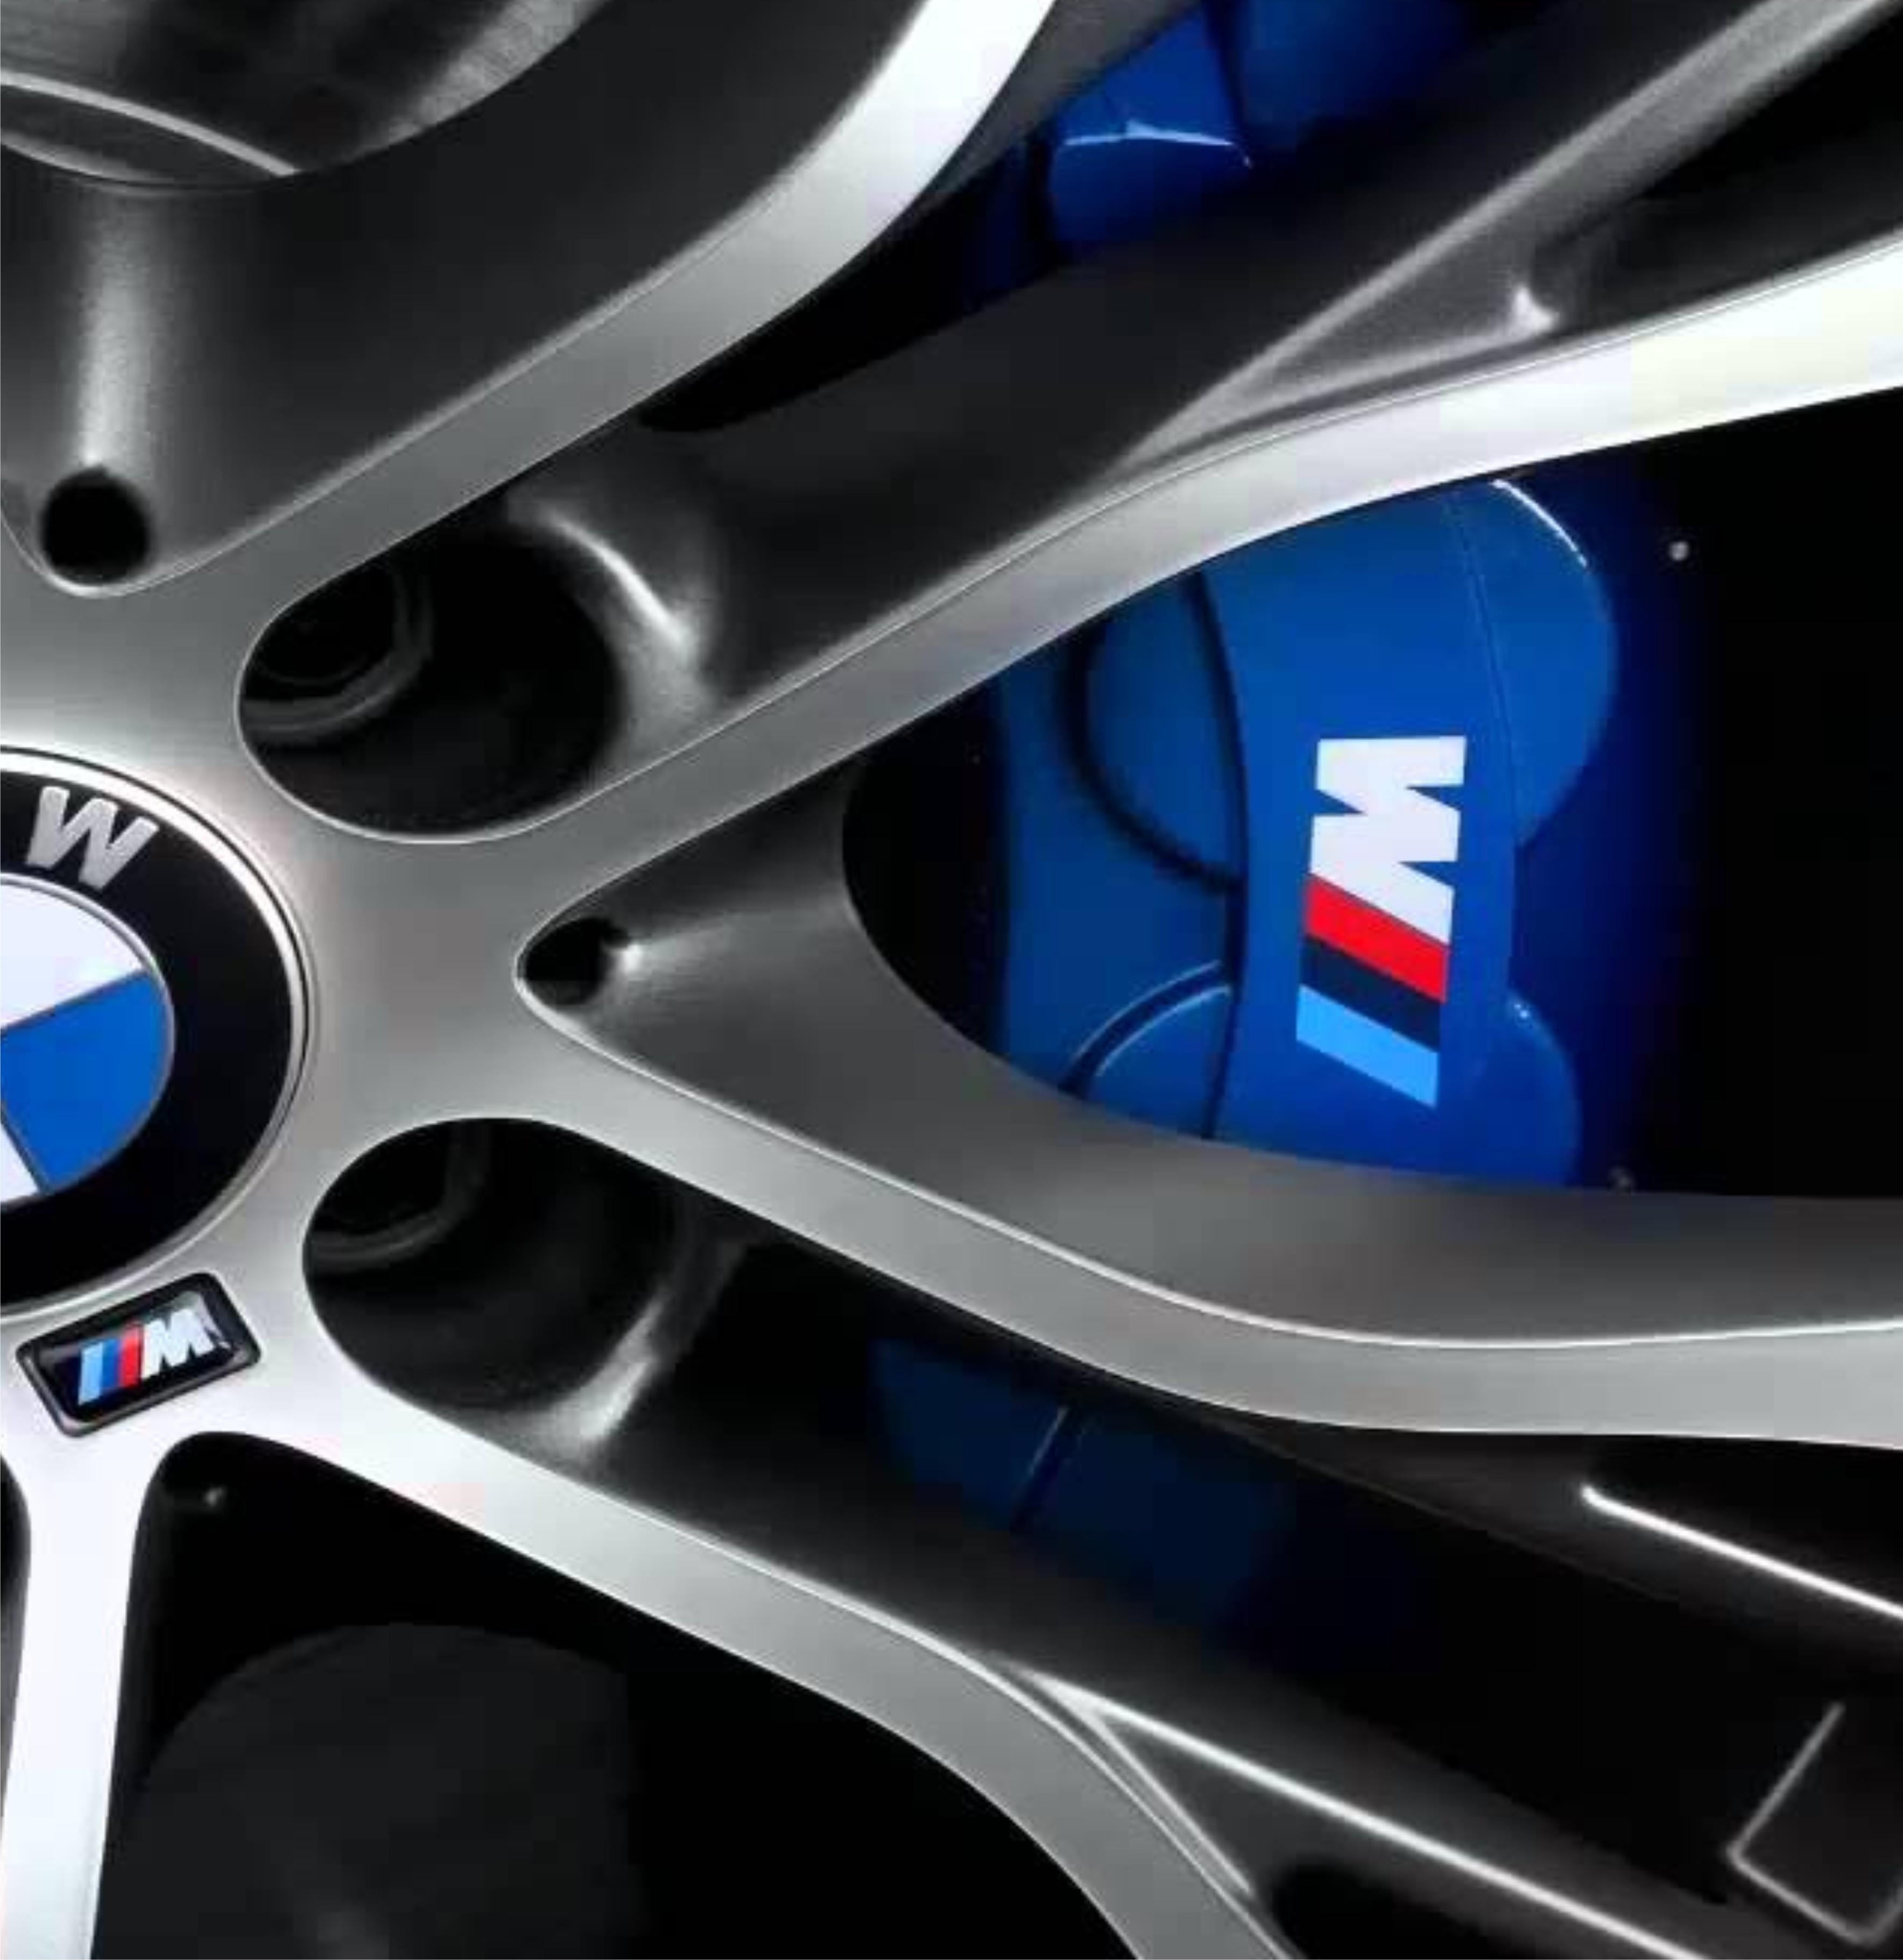 Details About Bmw M Sport M Tec Caliper Sticker Decal Logo F10 F20 F30 E60 E70 E71 E90 E91